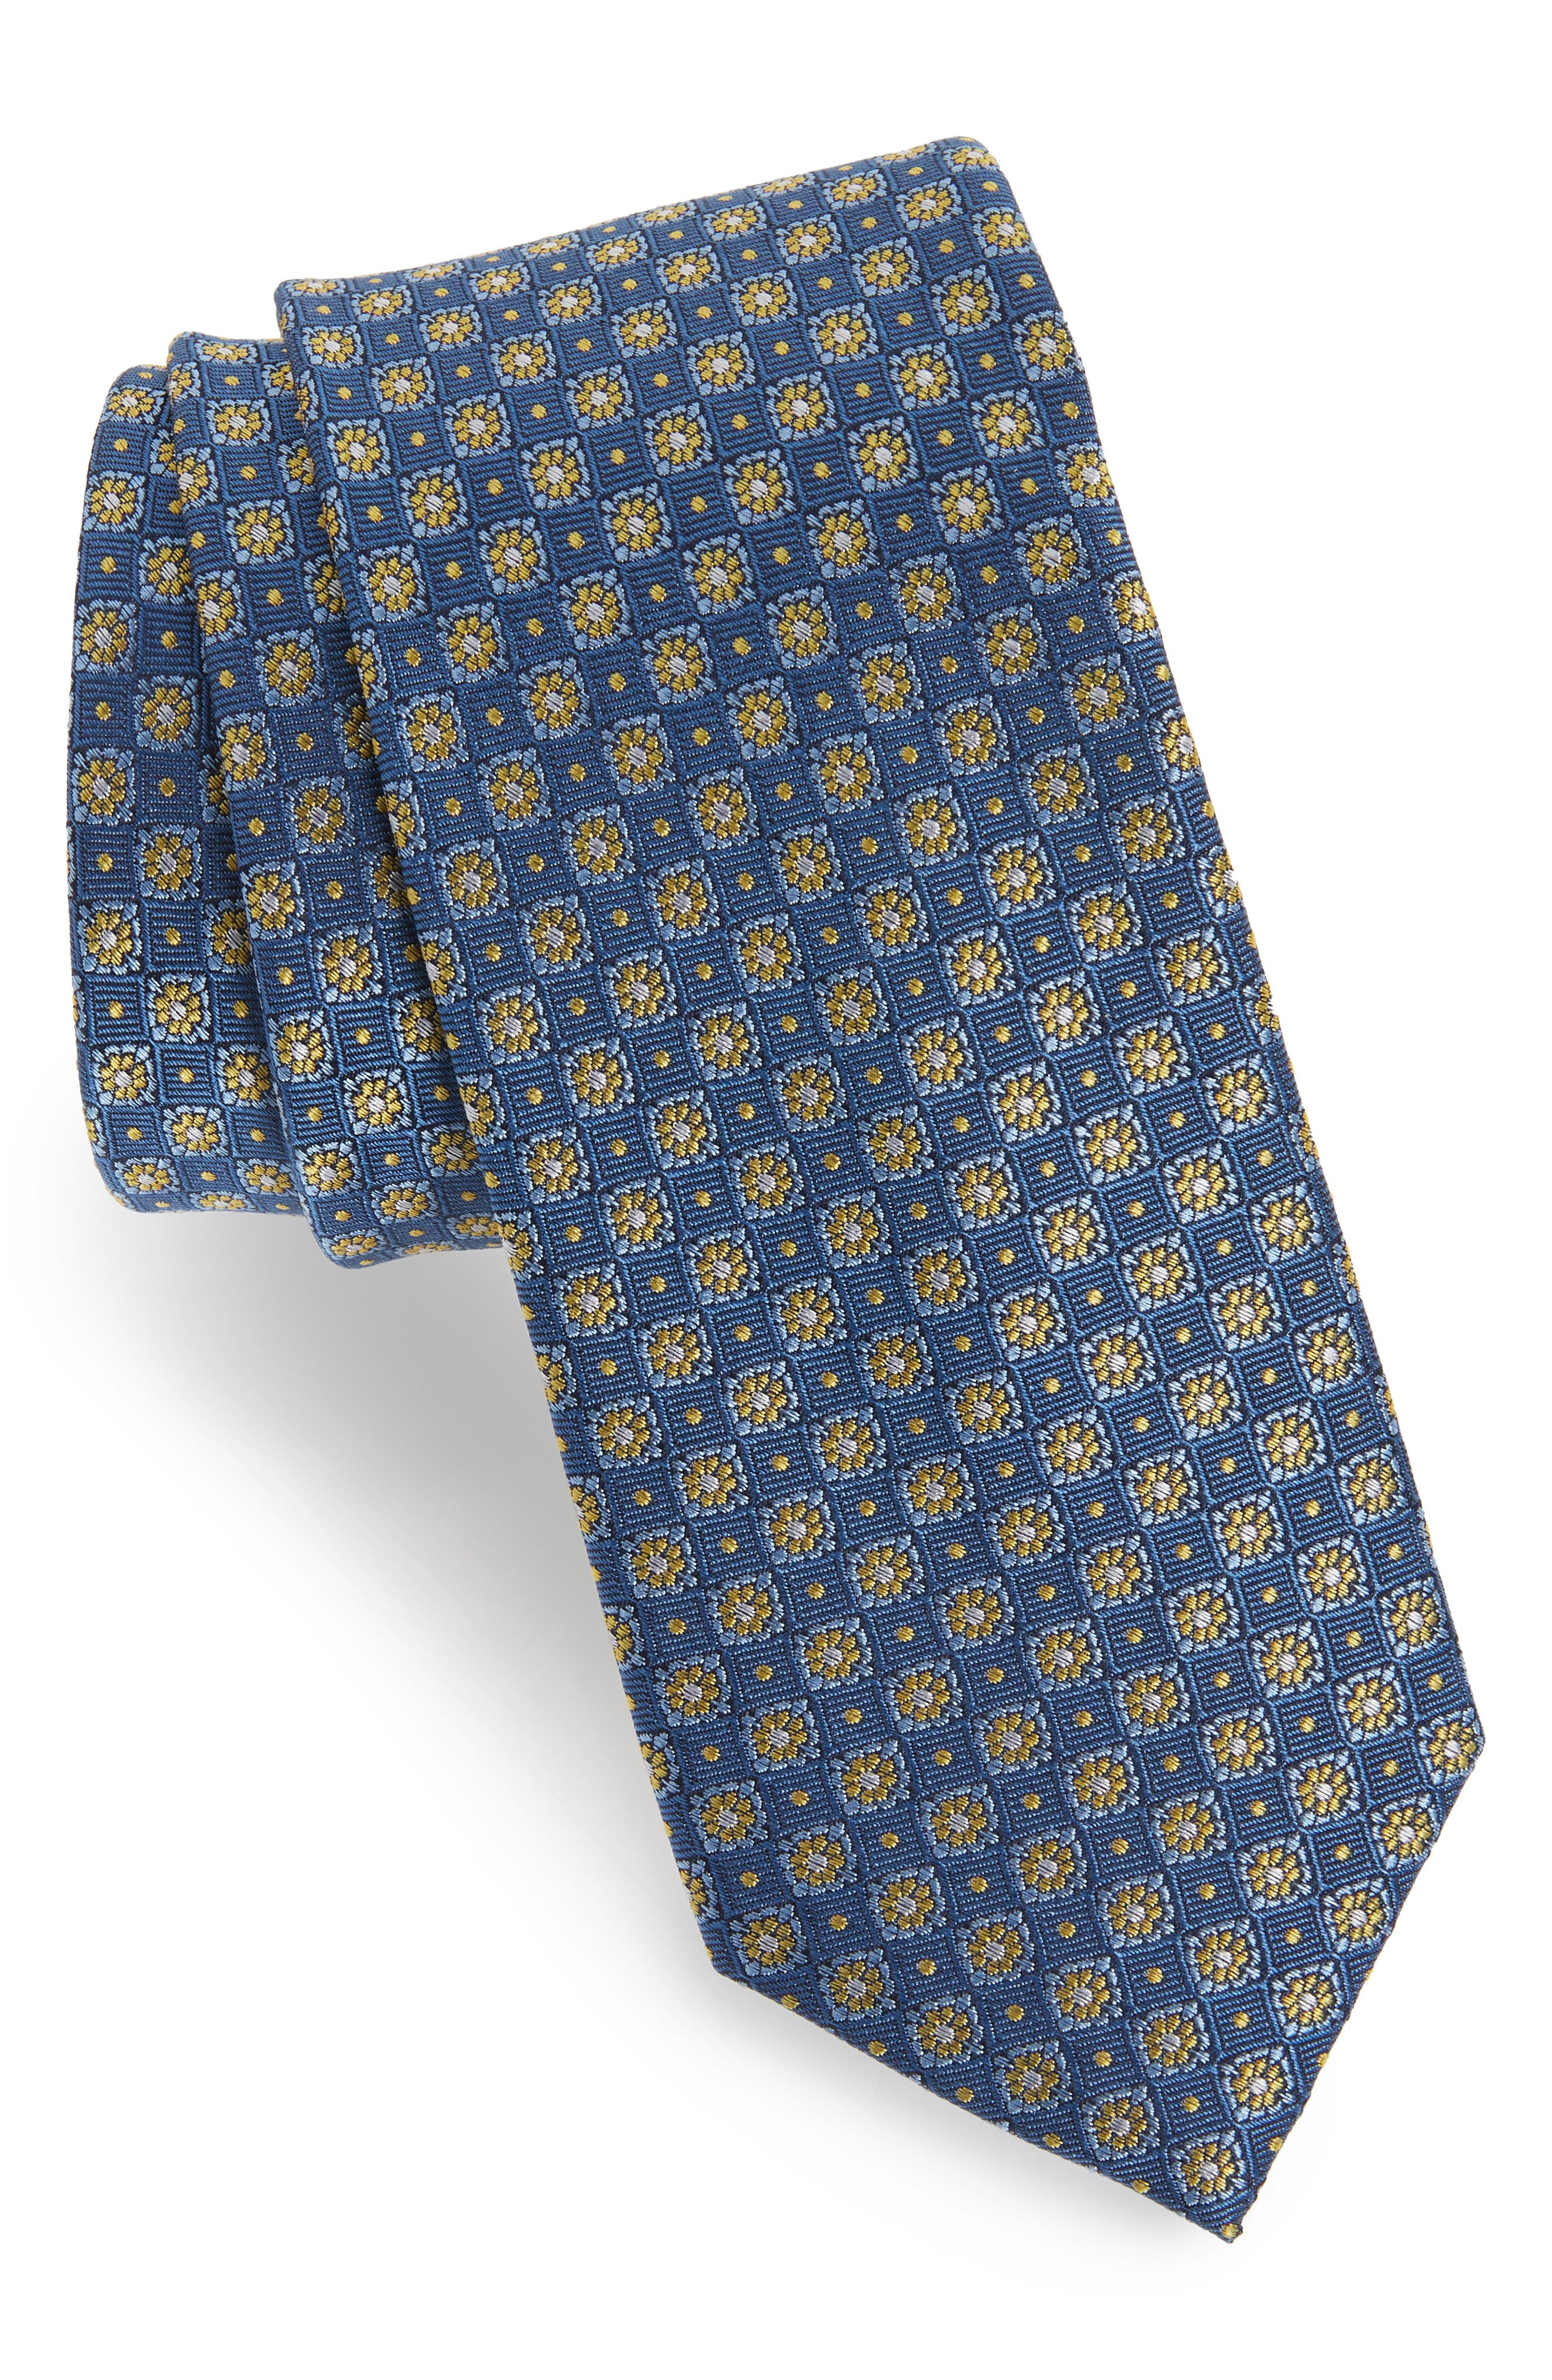 Homme Medallion Silk Tie,                             Main thumbnail 1, color,                             BLUE